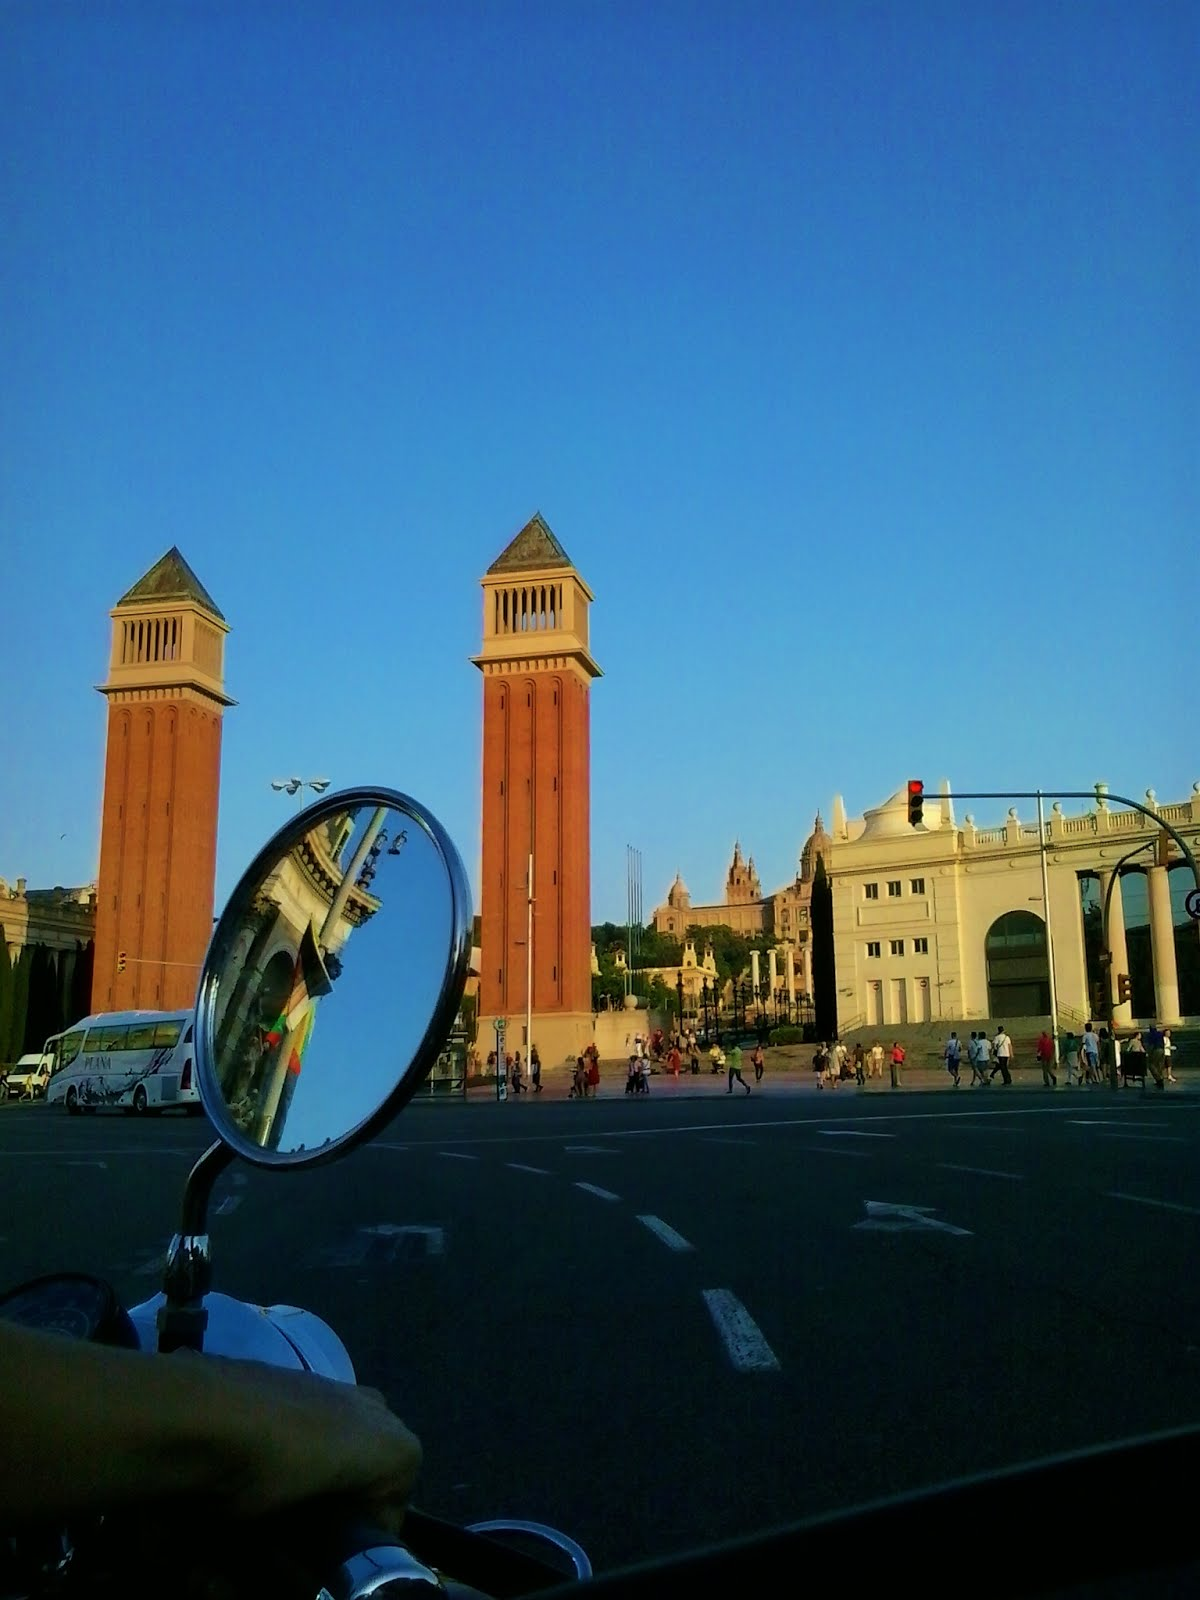 The Venetian Towers leads to the Magic Fountain and the Palau Nacional at Montjuïc